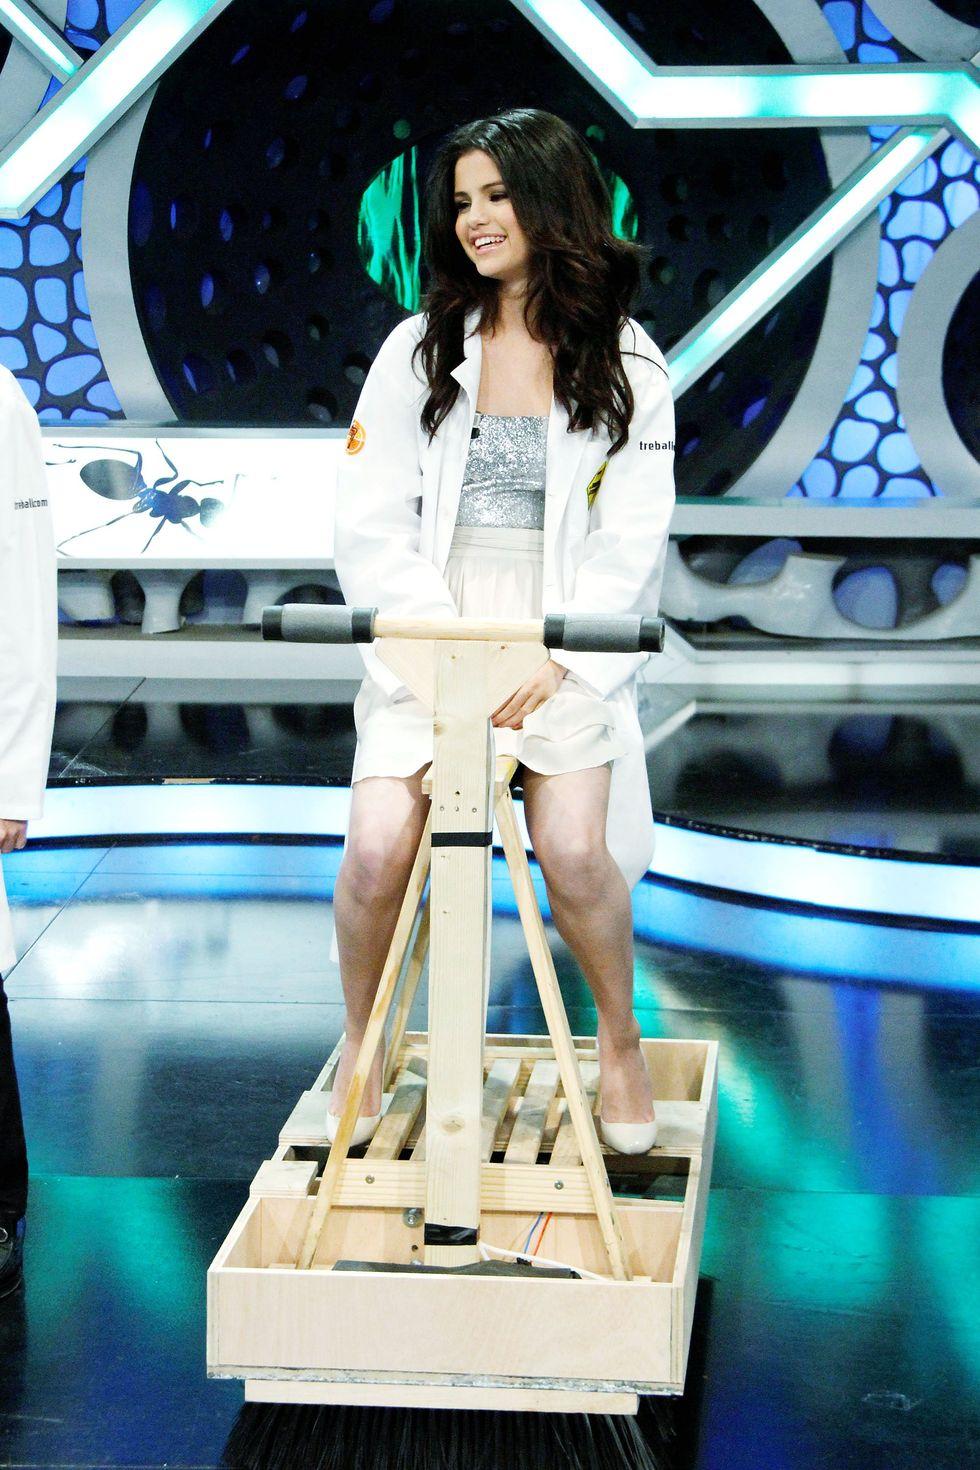 Selena Gomez 2010 : selena-gomez-el-hormiguero-tv-show-stills-hq-13